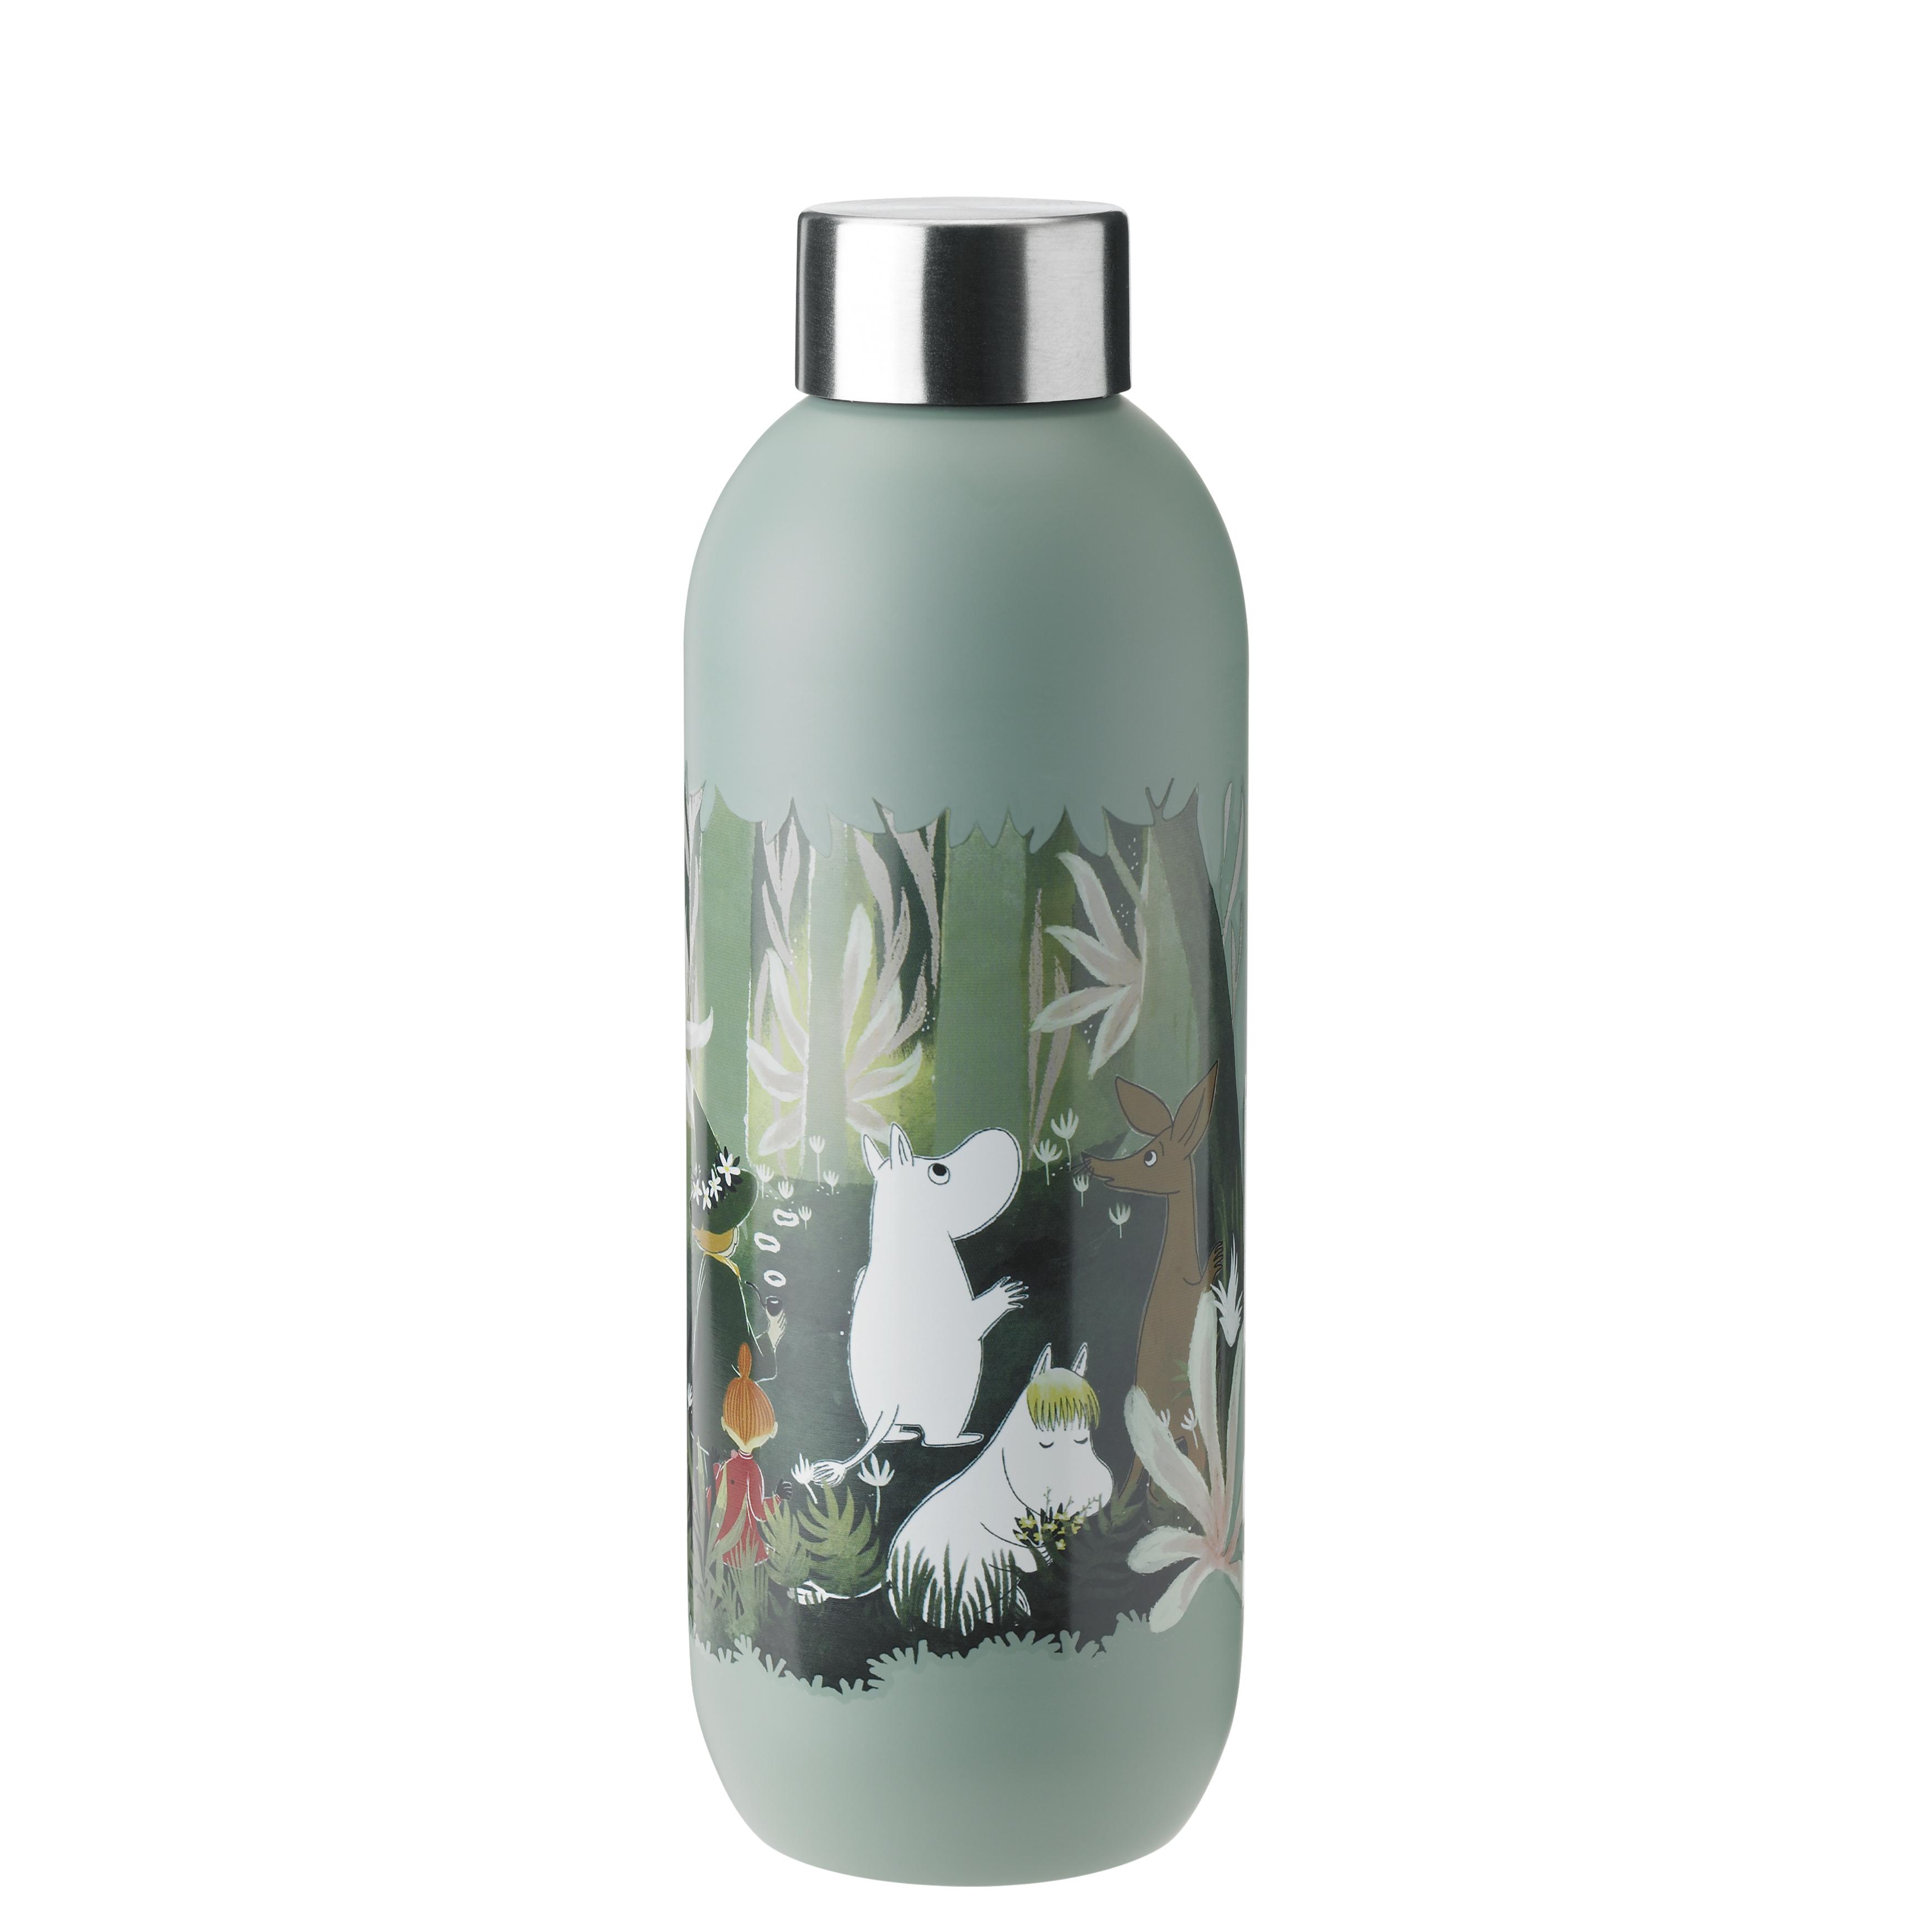 Stelton Mumi Keep Cool drikkeflaske, 750 ml, dusty green